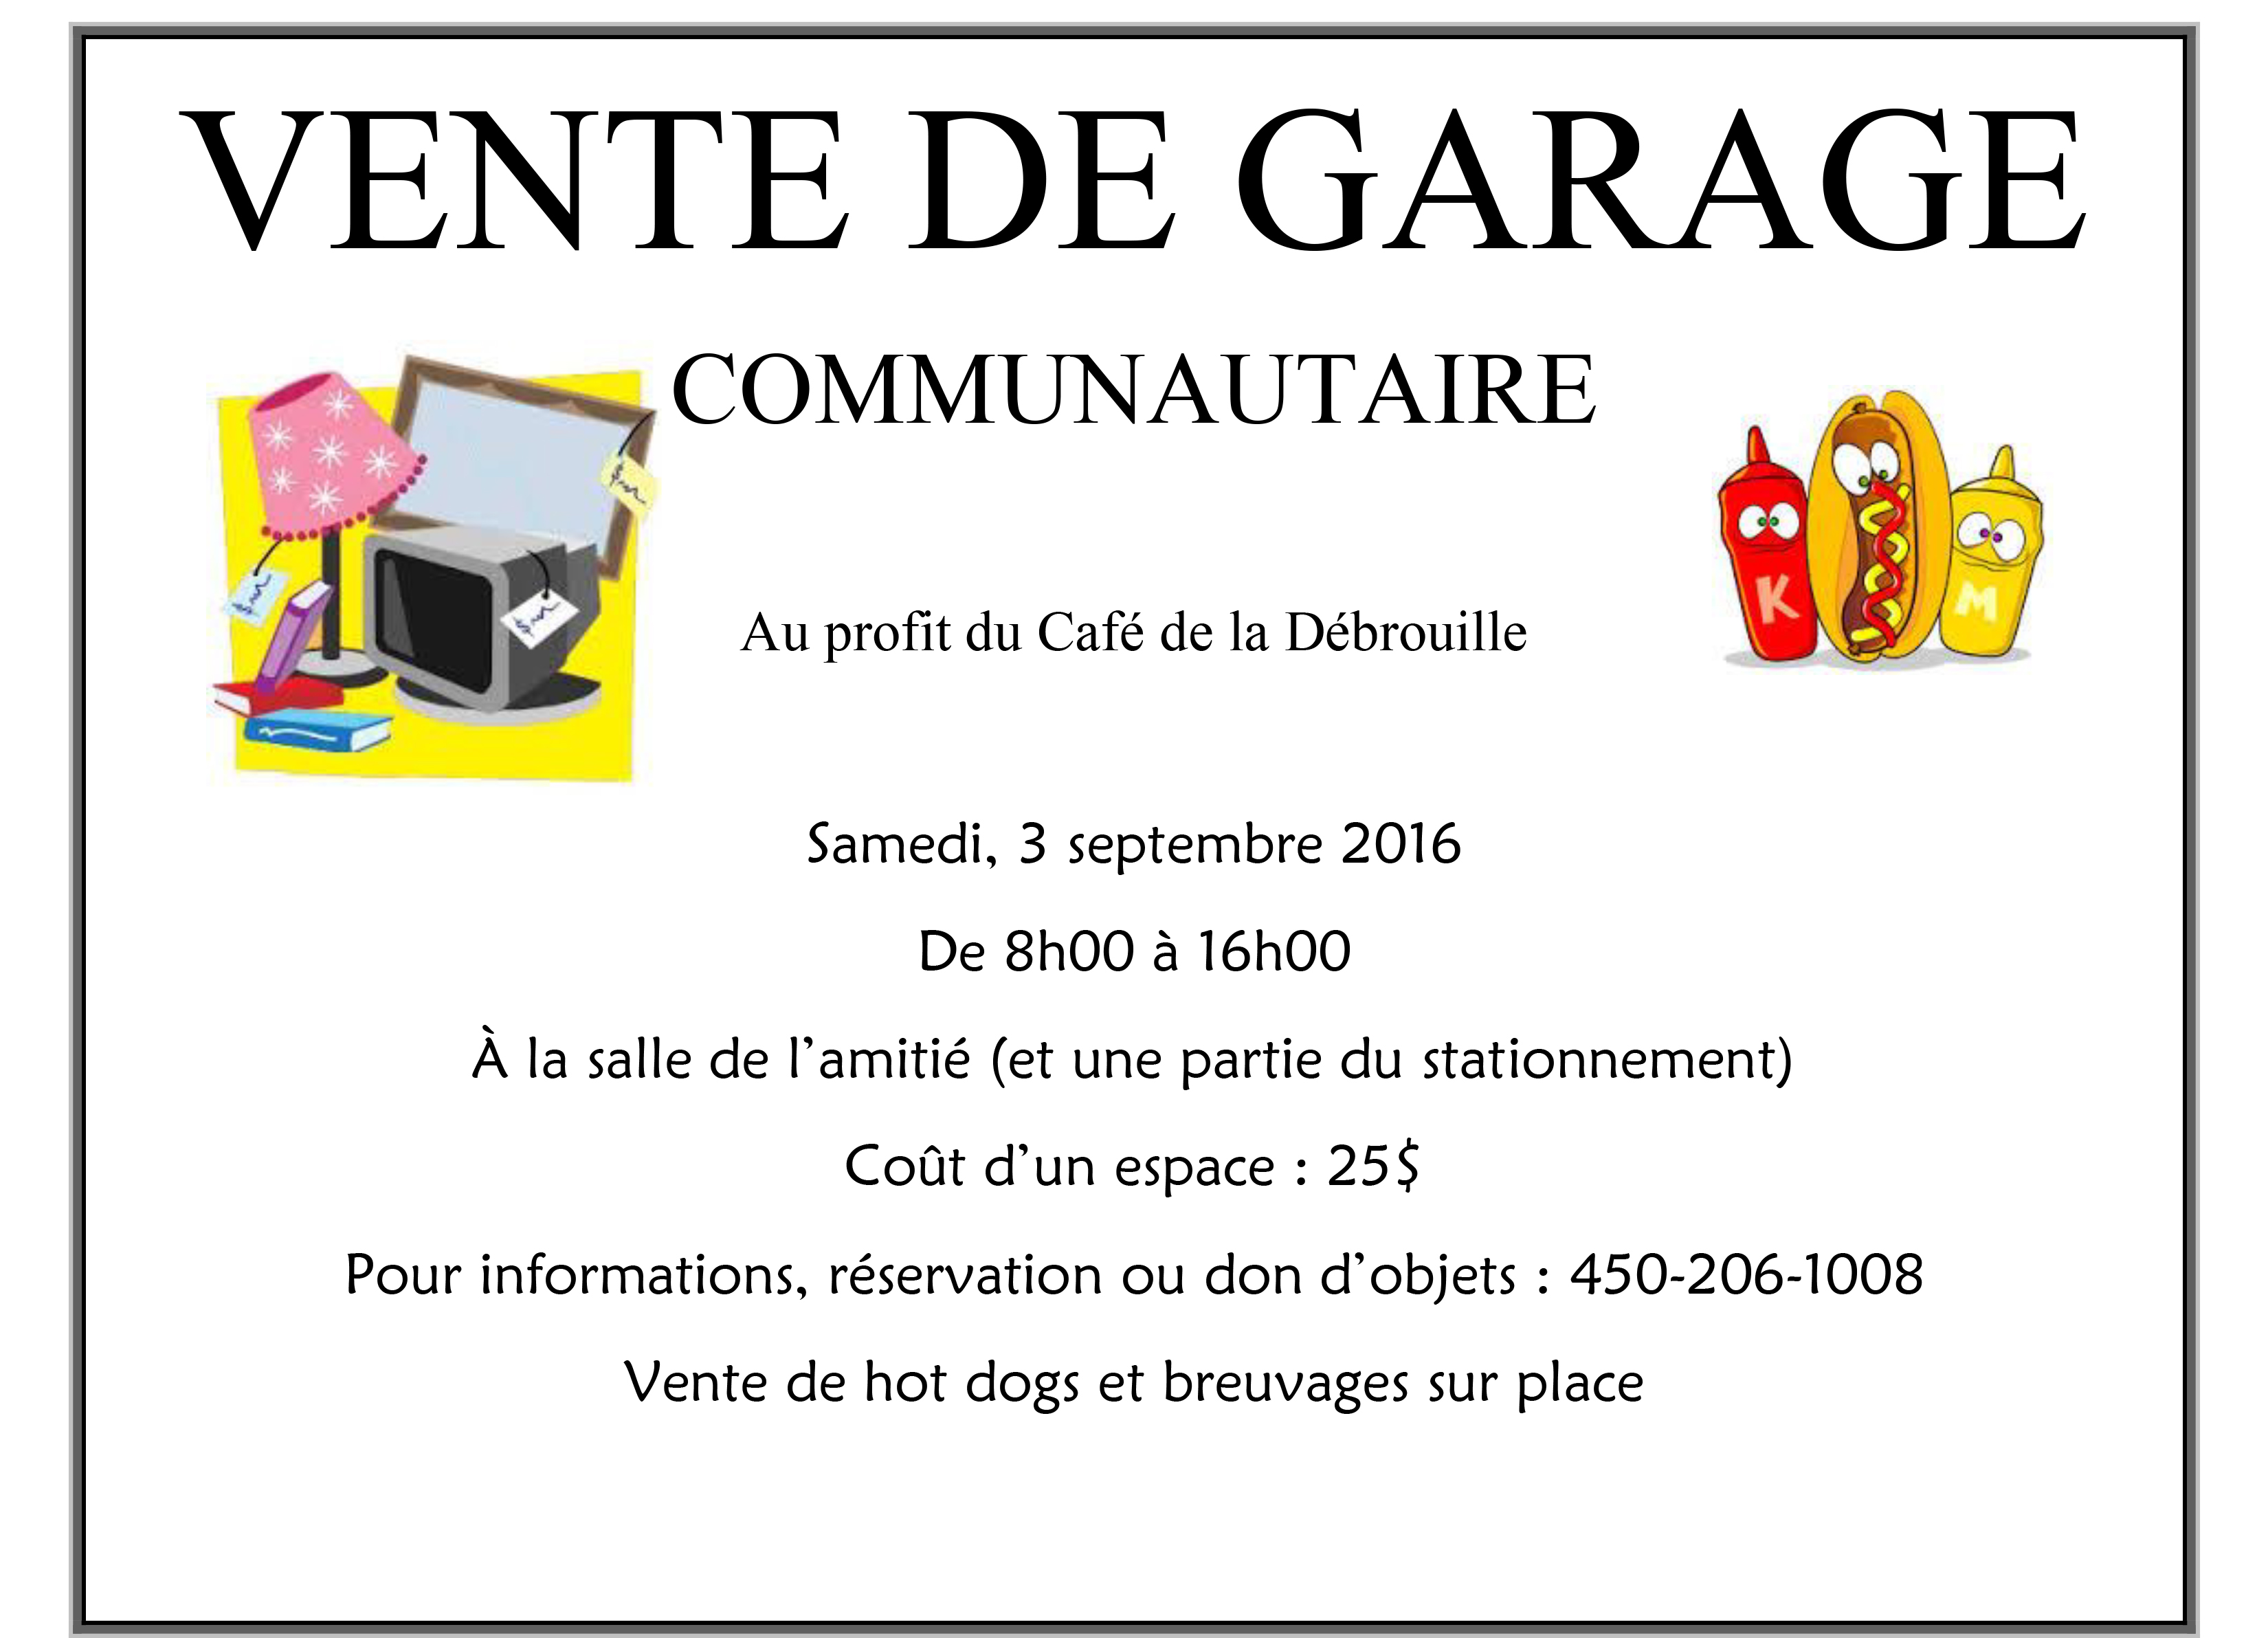 VENTE DE GARAGE COMMUNAUTAIRE - affiche 2016